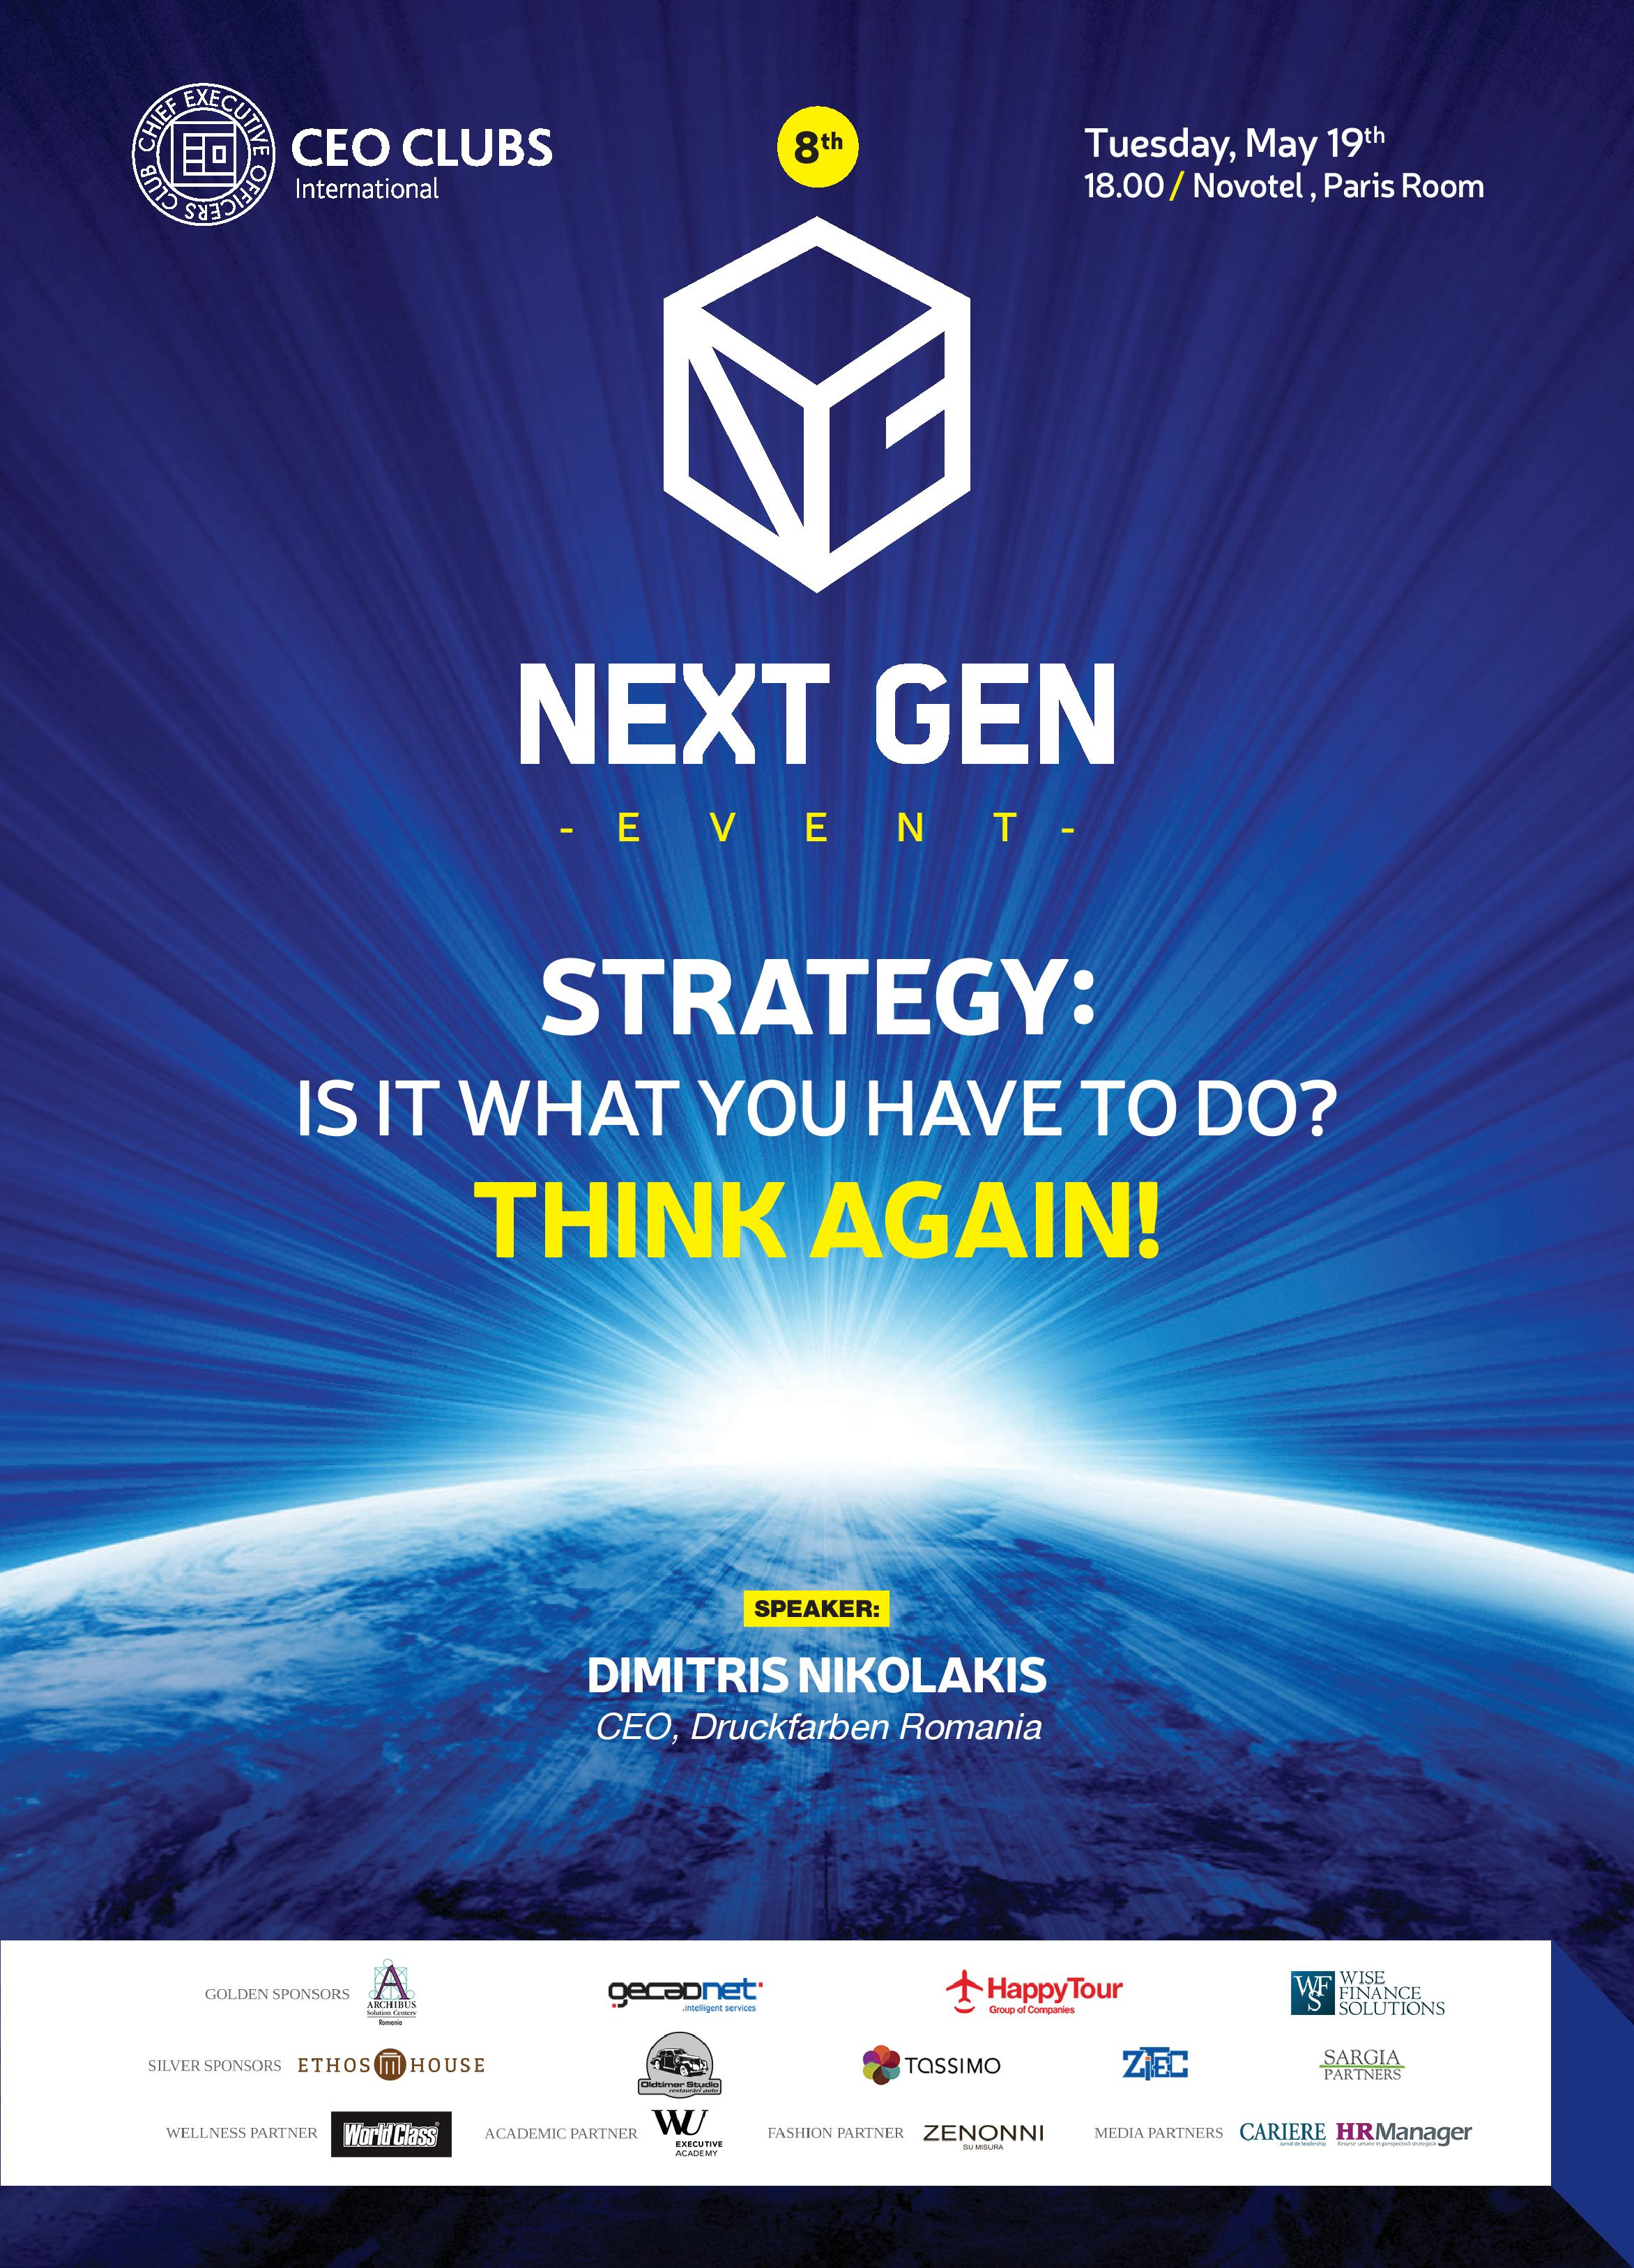 8th Next Gen Event